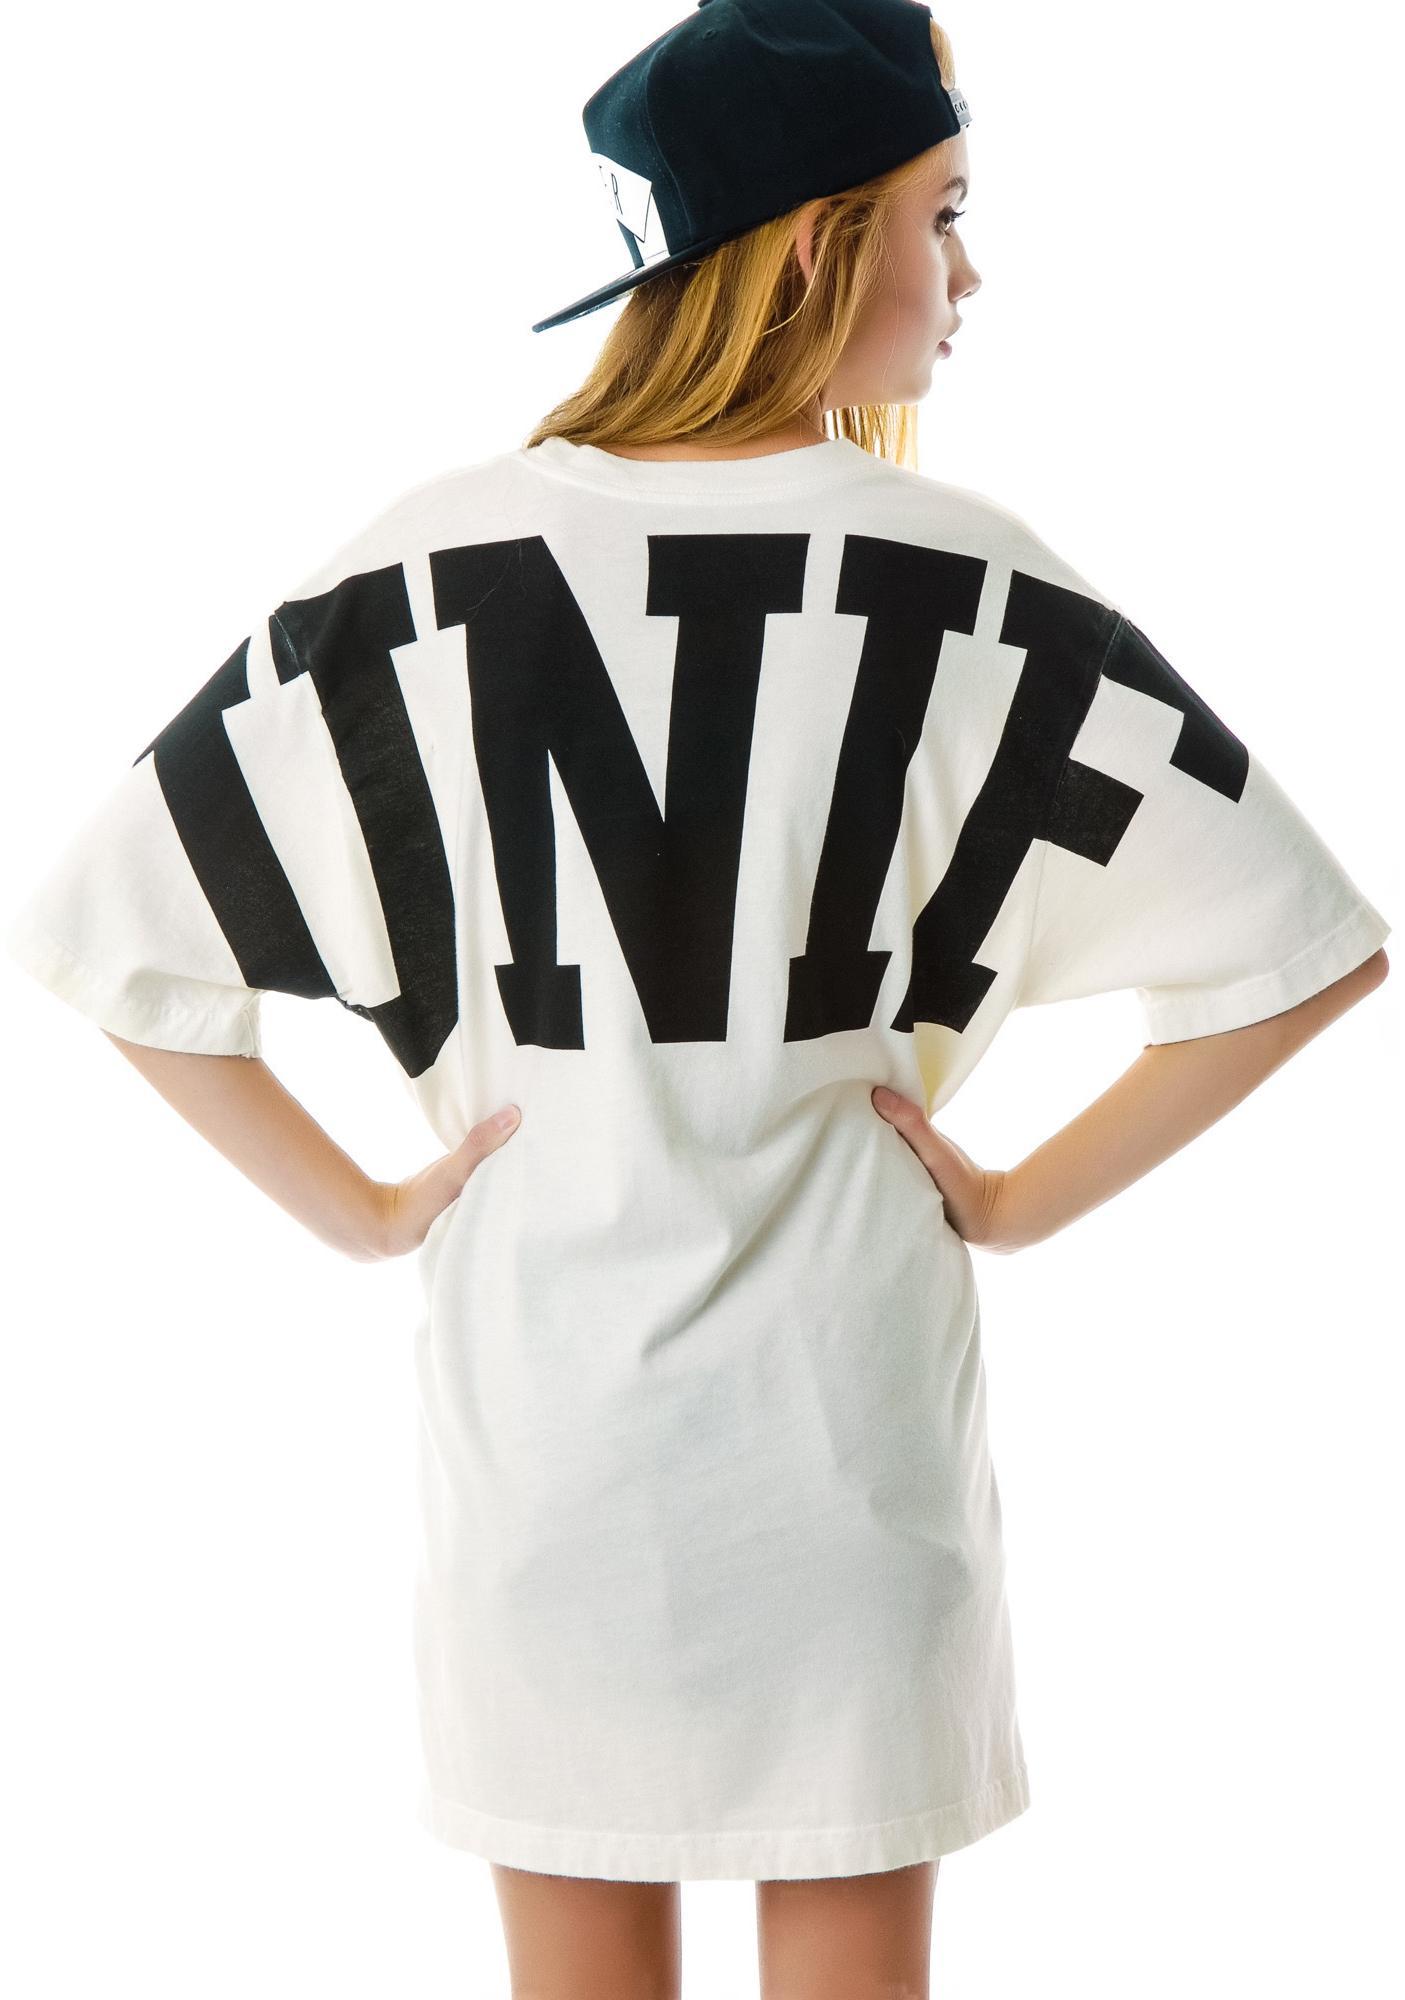 UNIF Revelation Tee